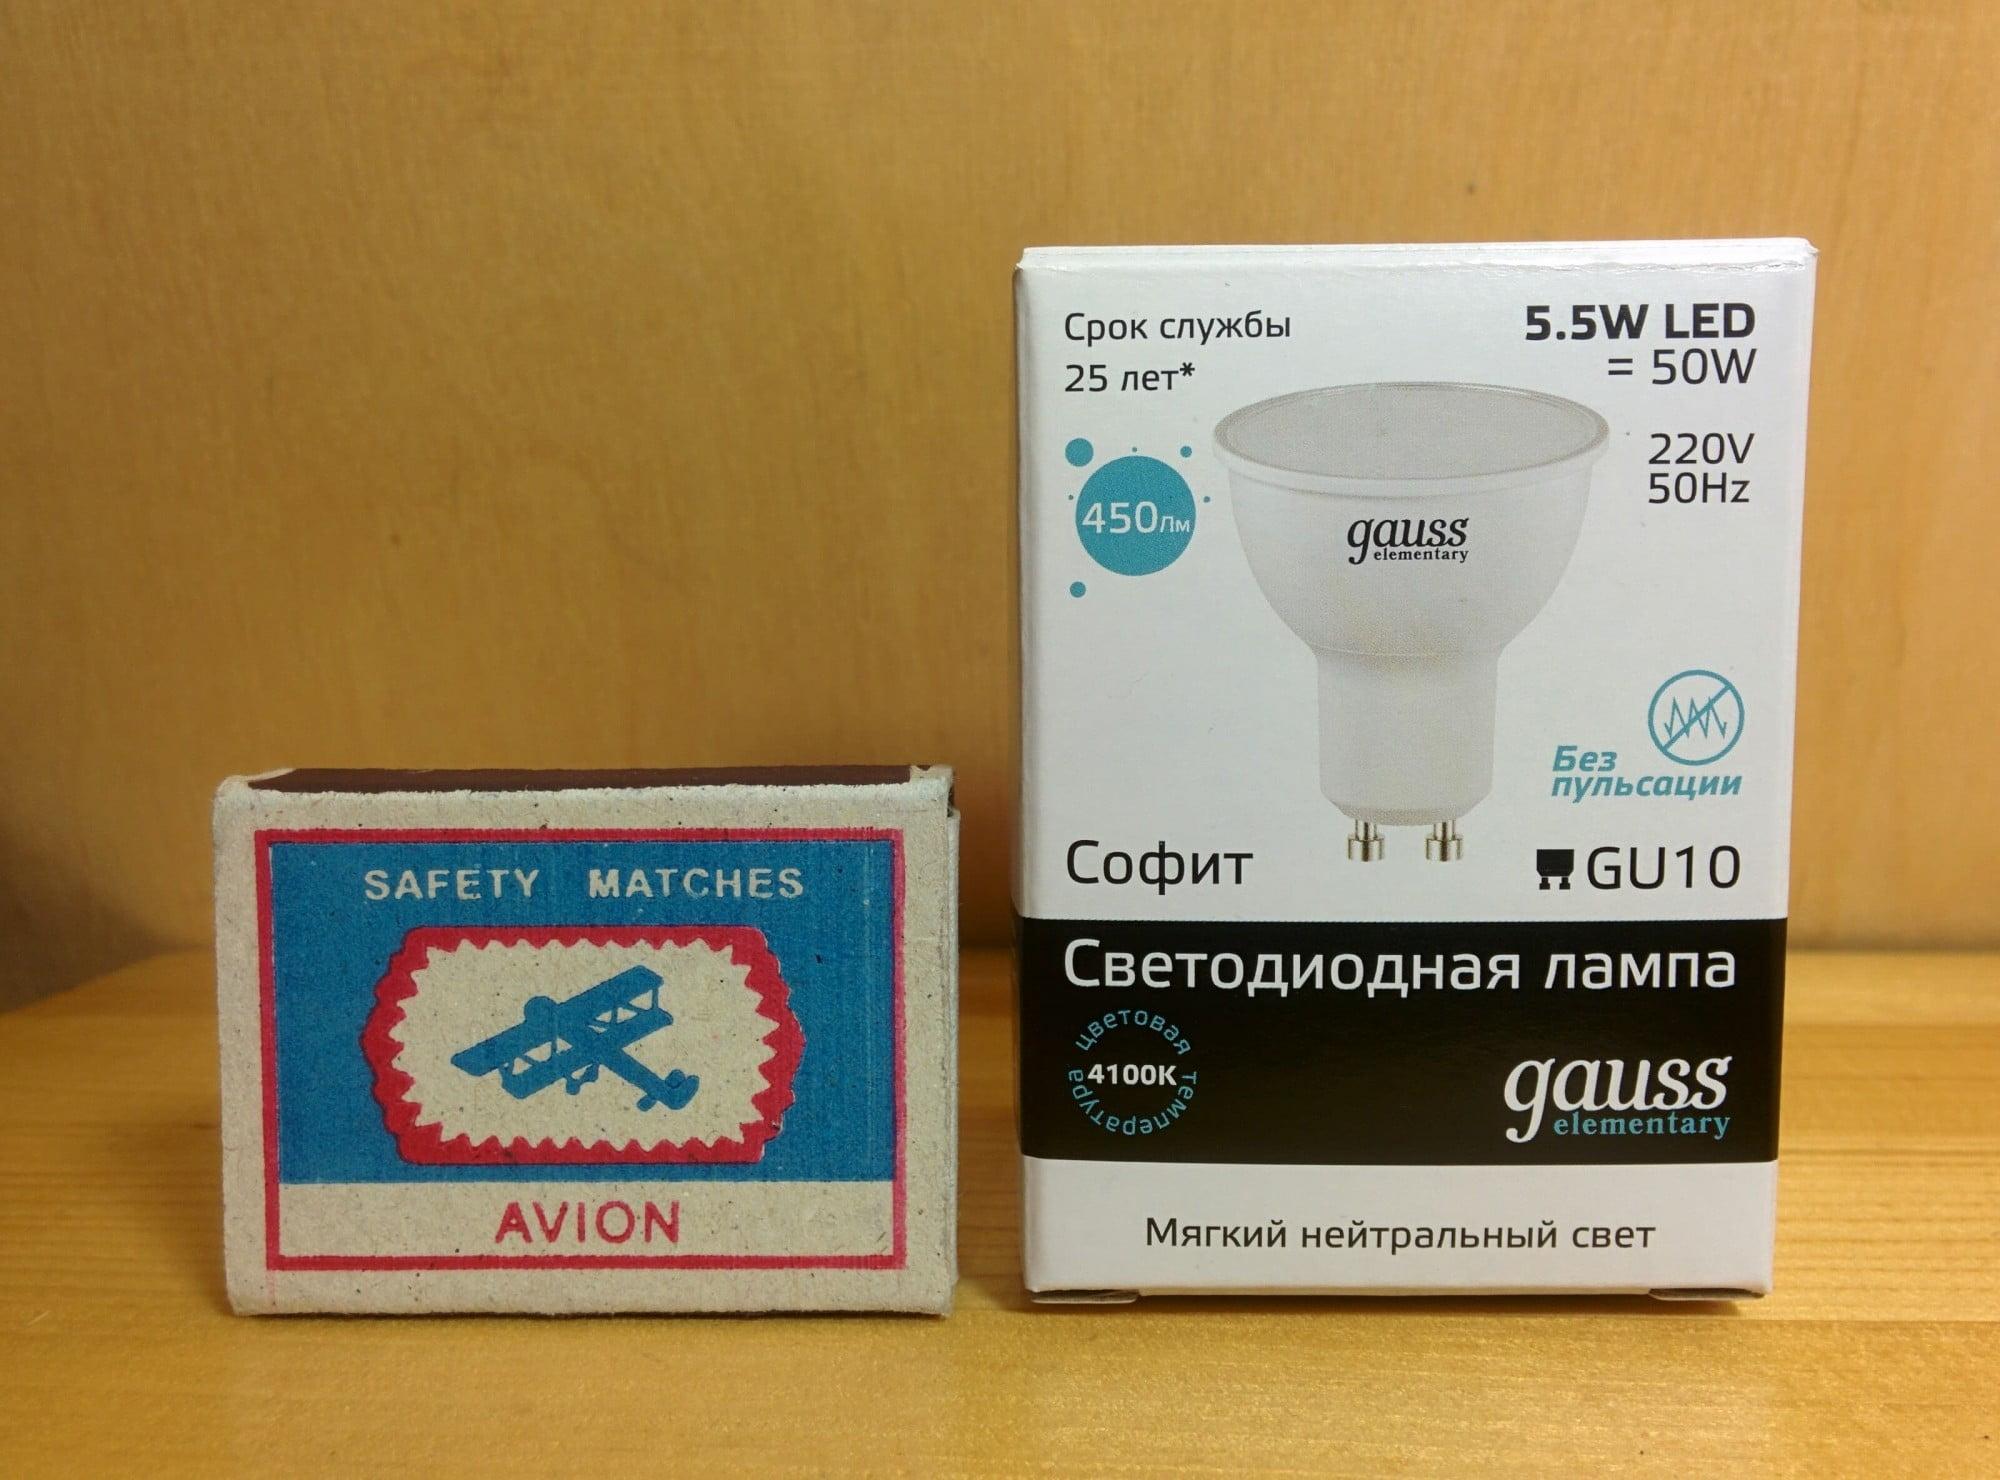 Gauss LED Elementary MR16 GU10 5.5W 4100К упаковка